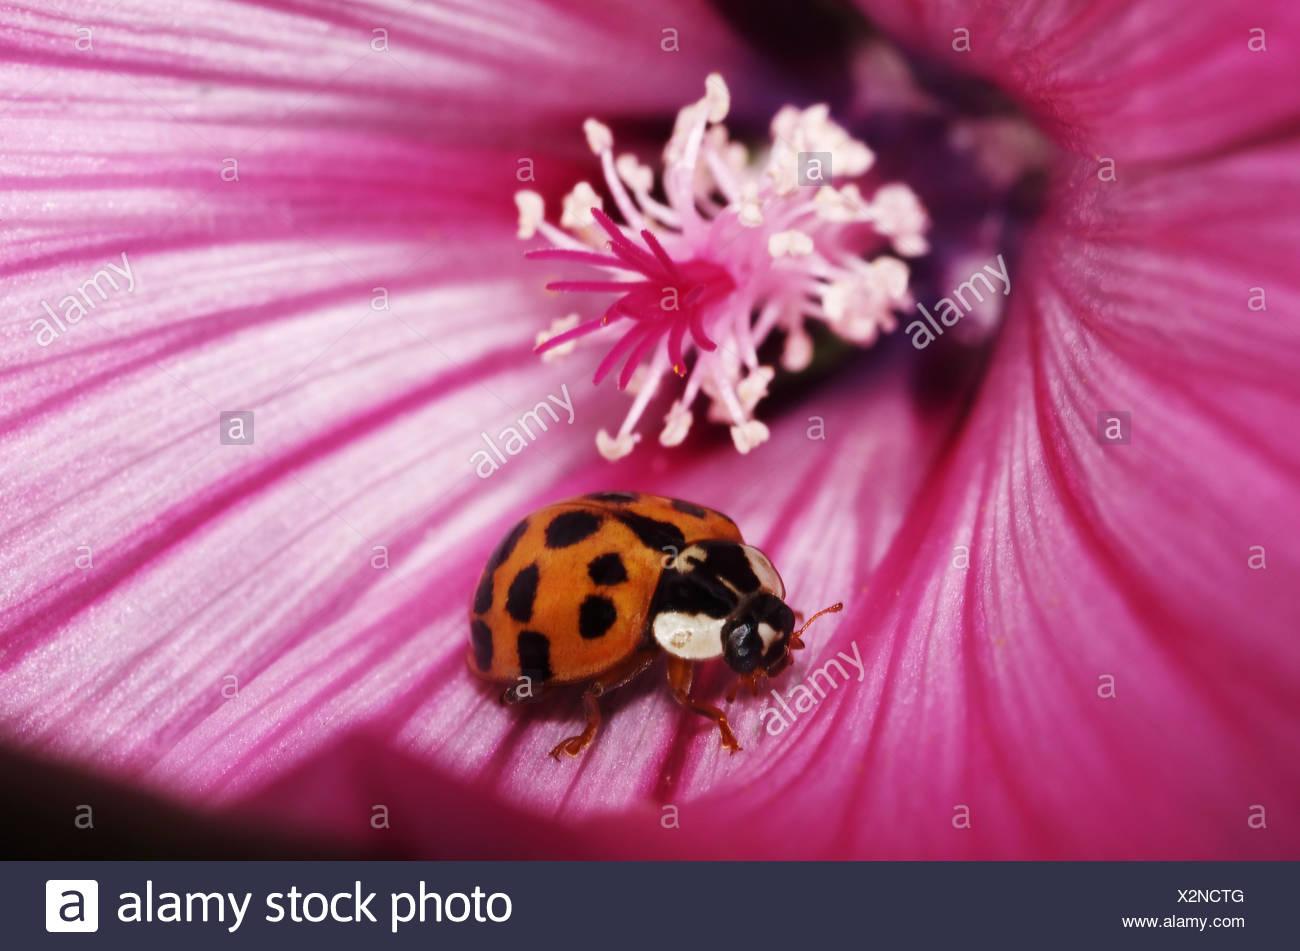 Marienkäfer auf Malvenblüte Stock Photo